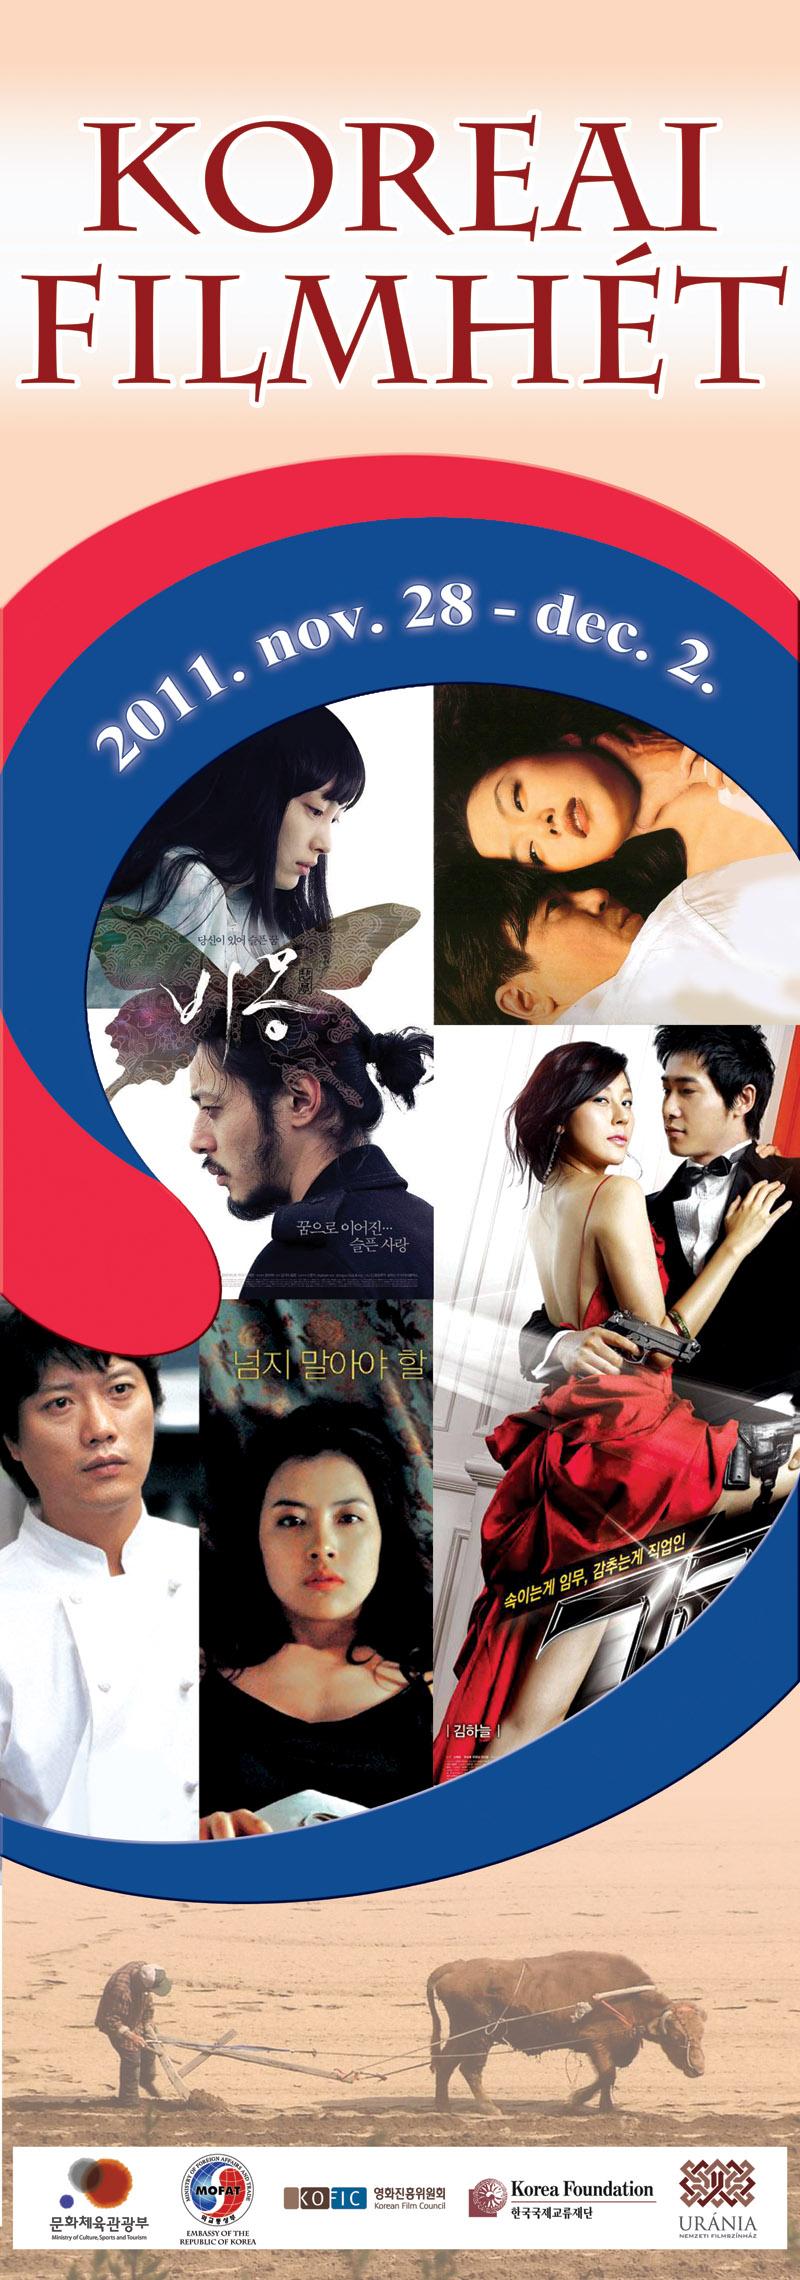 koreai_filmhet_molino